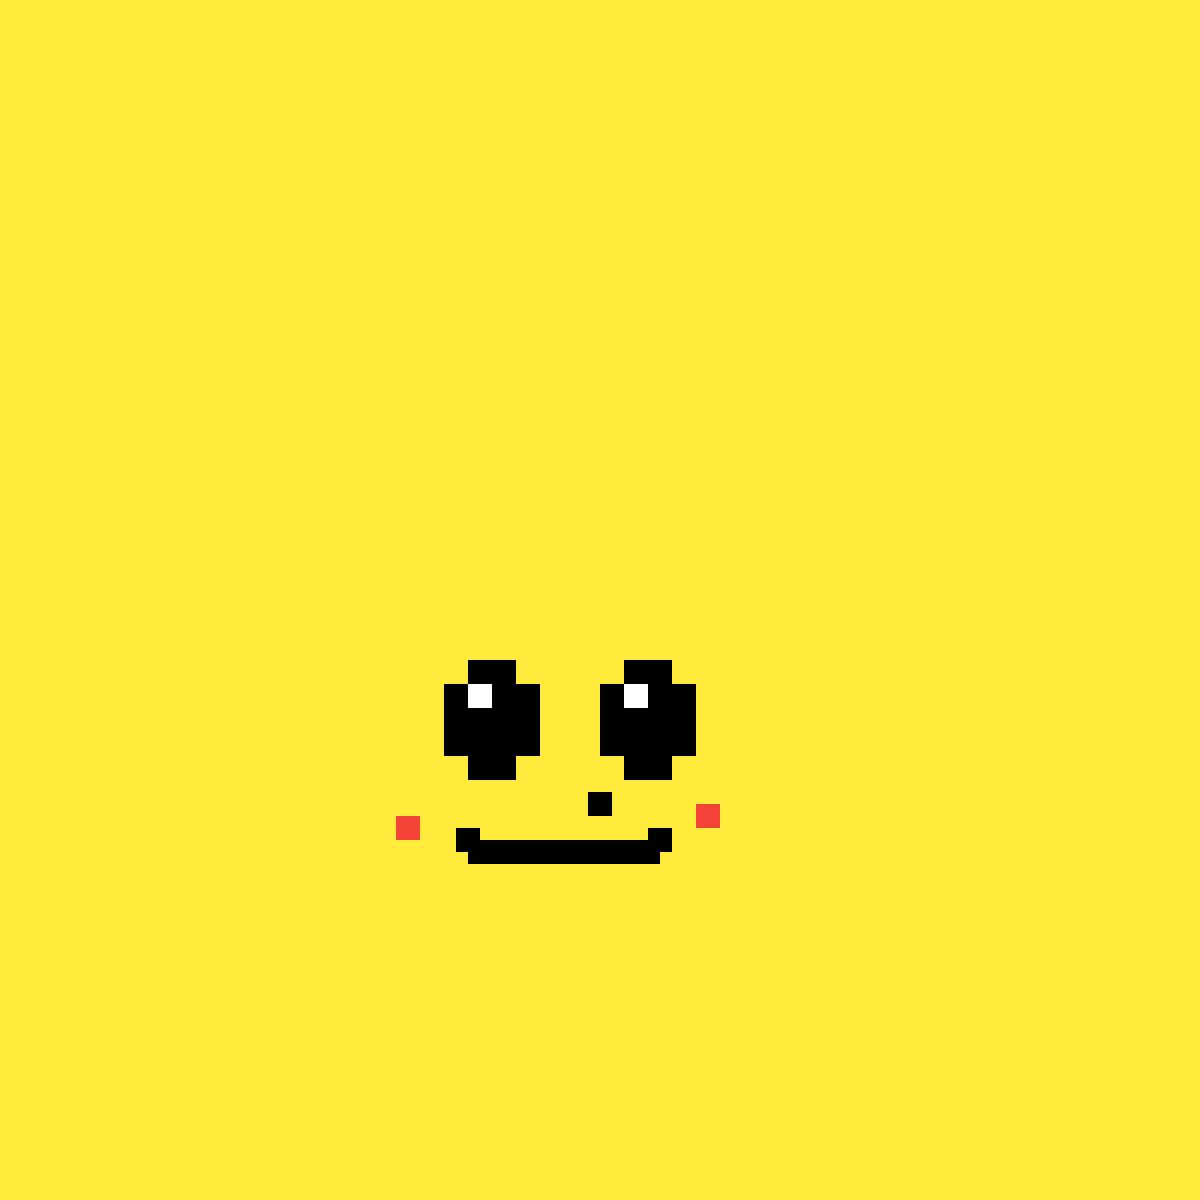 Pikachu Background   by Skeletor6225